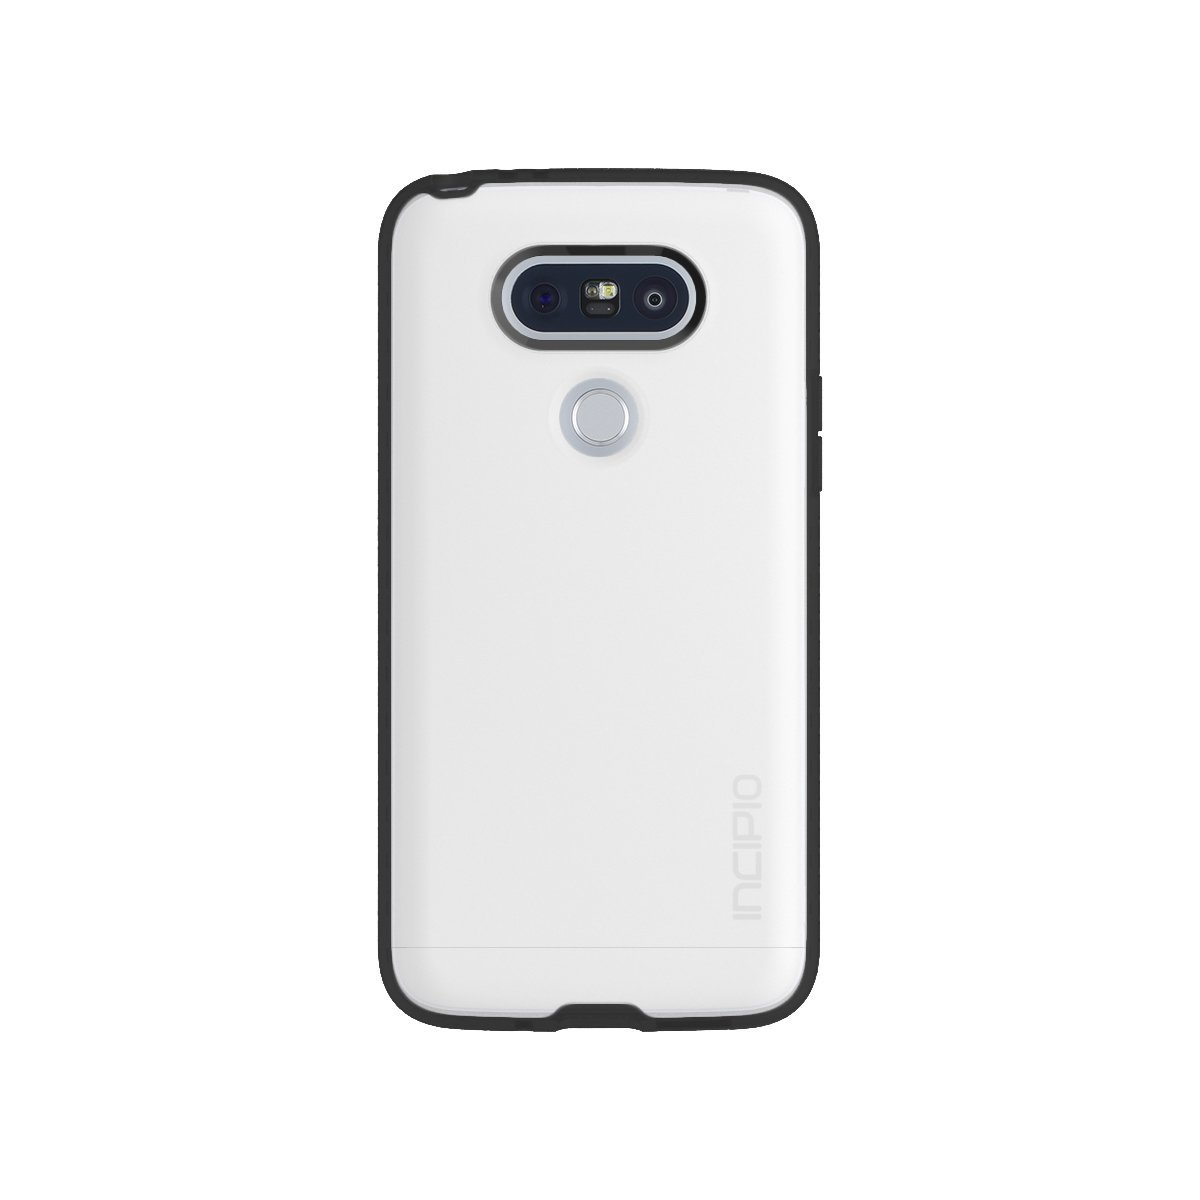 buy popular ad597 b9d17 Details about OEM Incipio Octane Frost/Black Case For LG G5